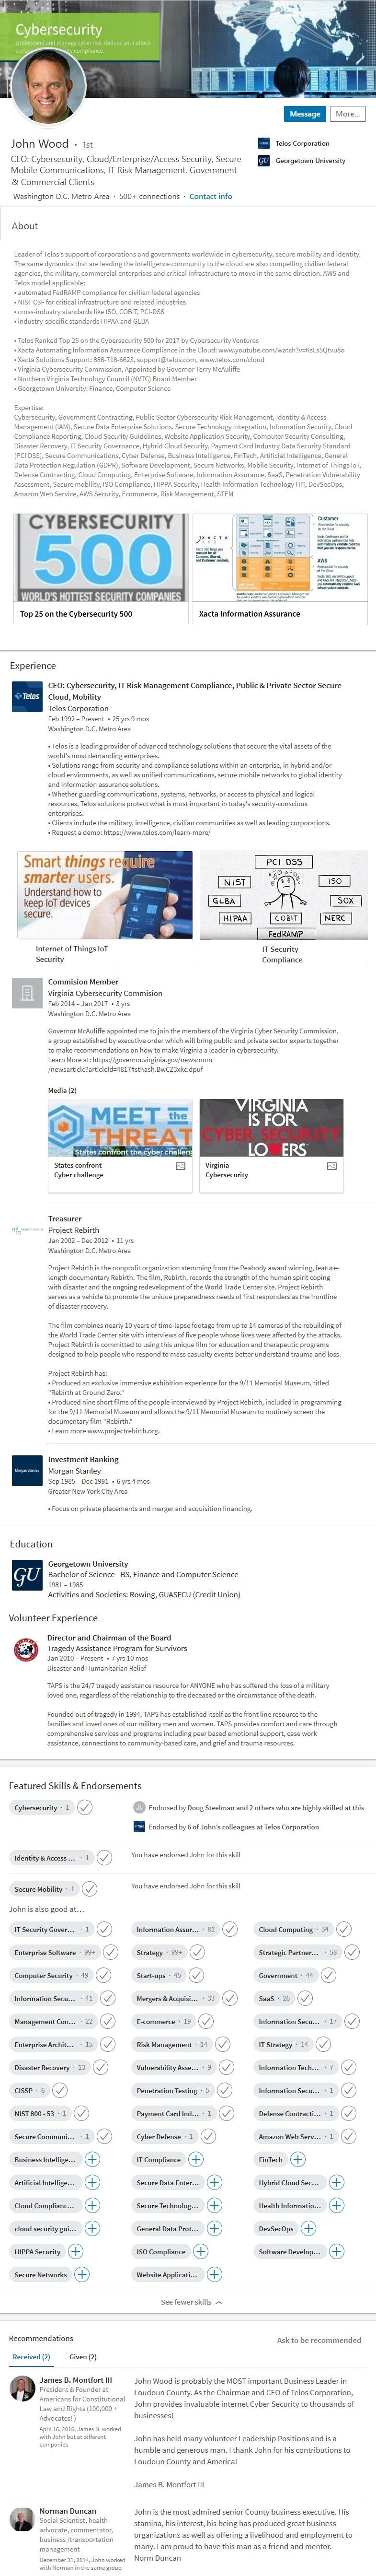 Profile 1800 Sample Linkedin Profile Example Technology Cybersecurity Ceo